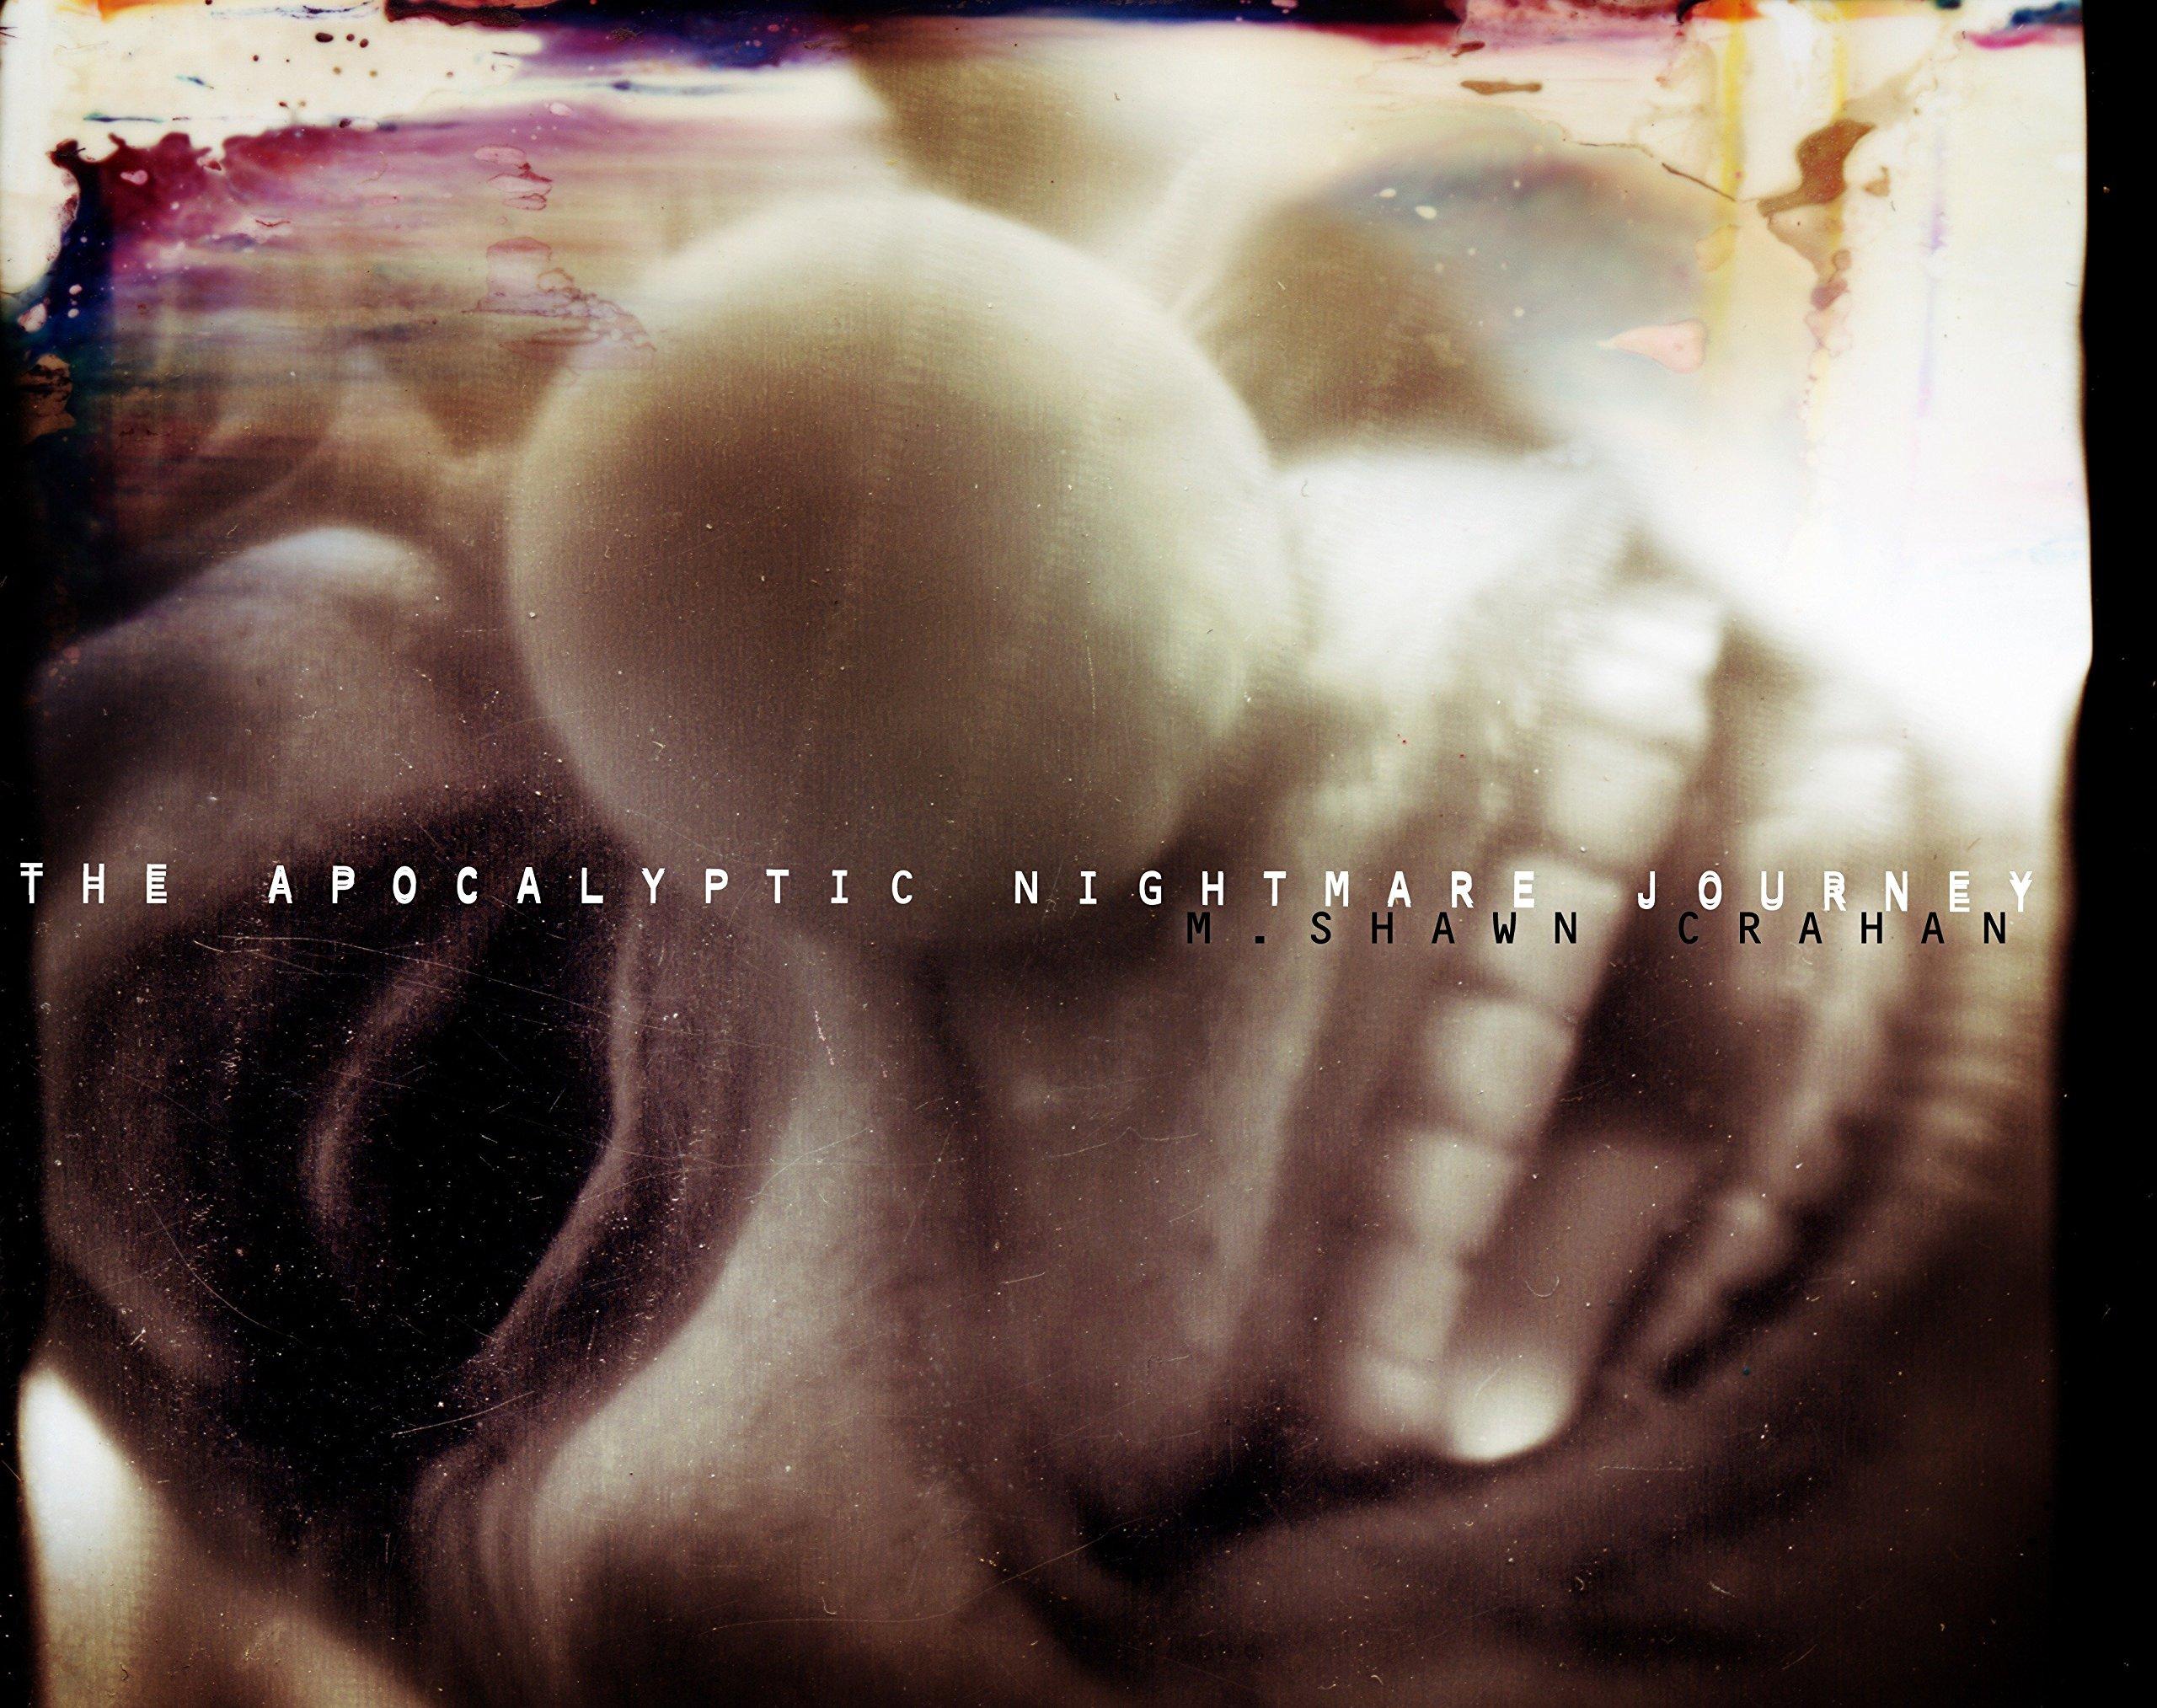 The Apocalyptic Nightmare Journey